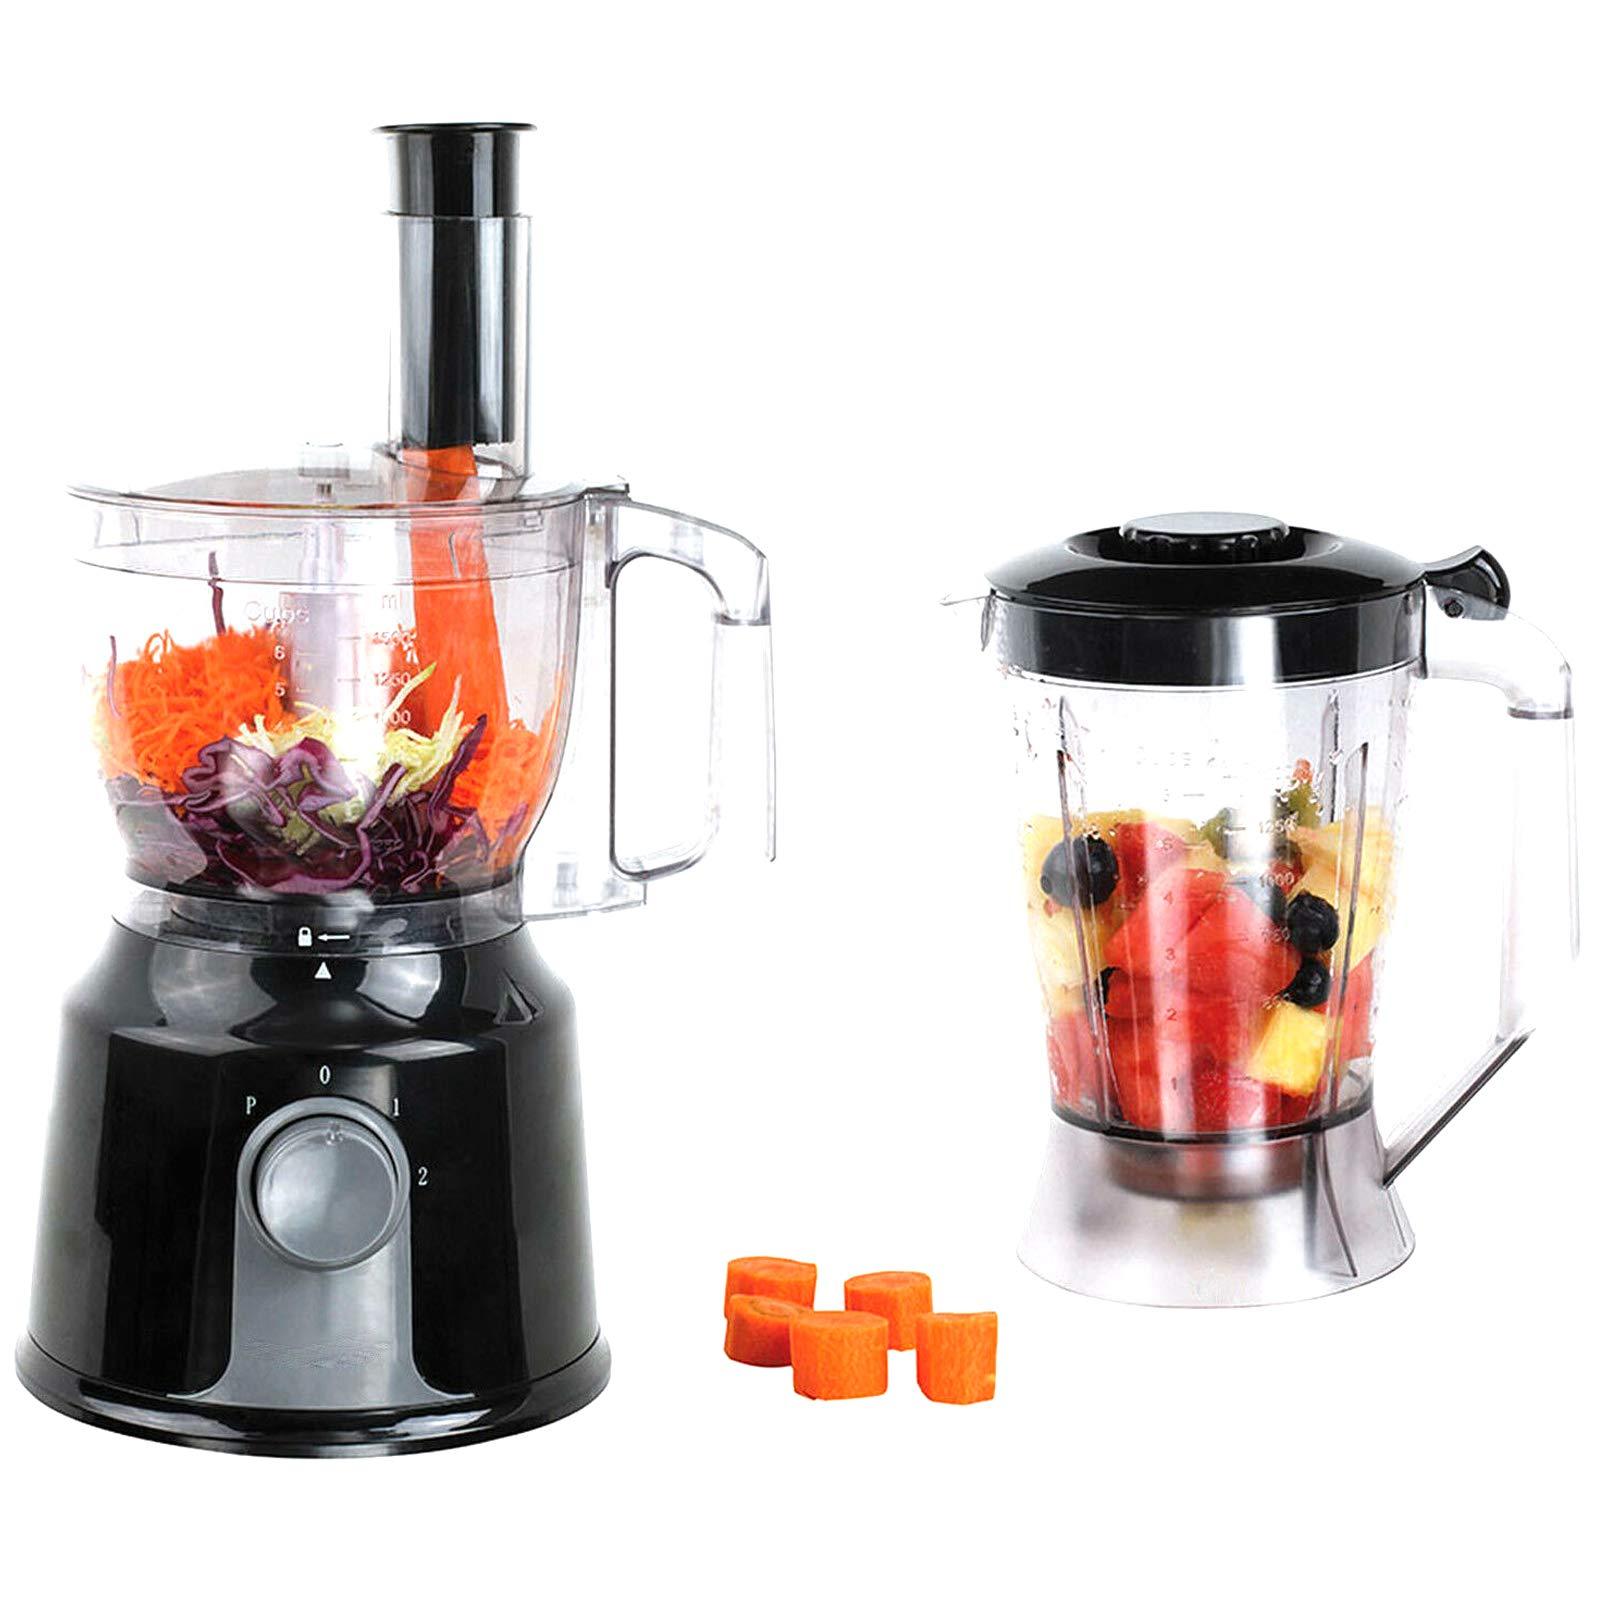 ONOGAL Robot de Cocina Multifuncion Batidora Pica Amasa Mezcla Bate Emulsiona 6367: Amazon.es